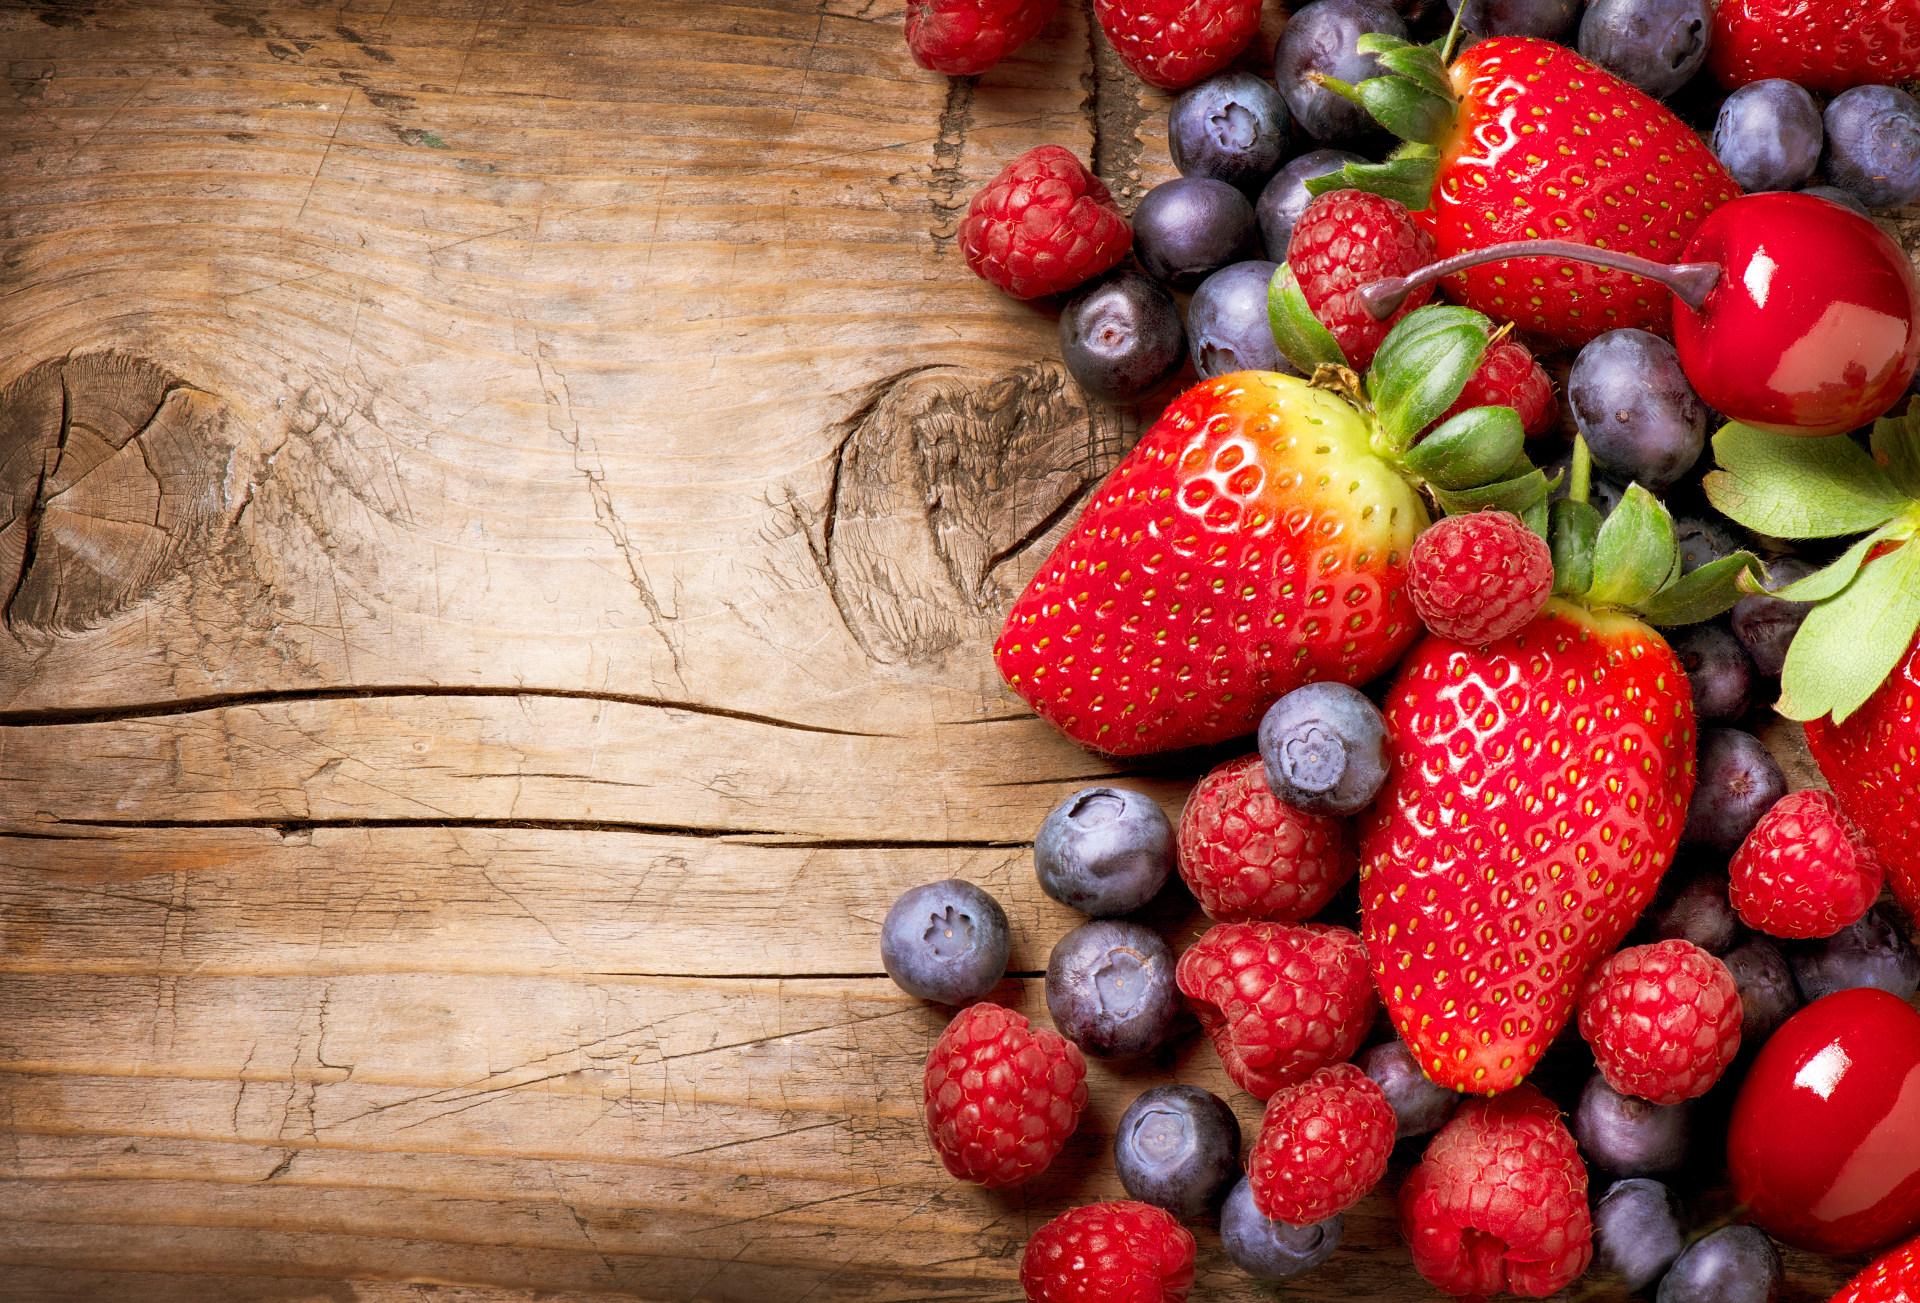 bigstock-berries-on-wooden-background-42586828_